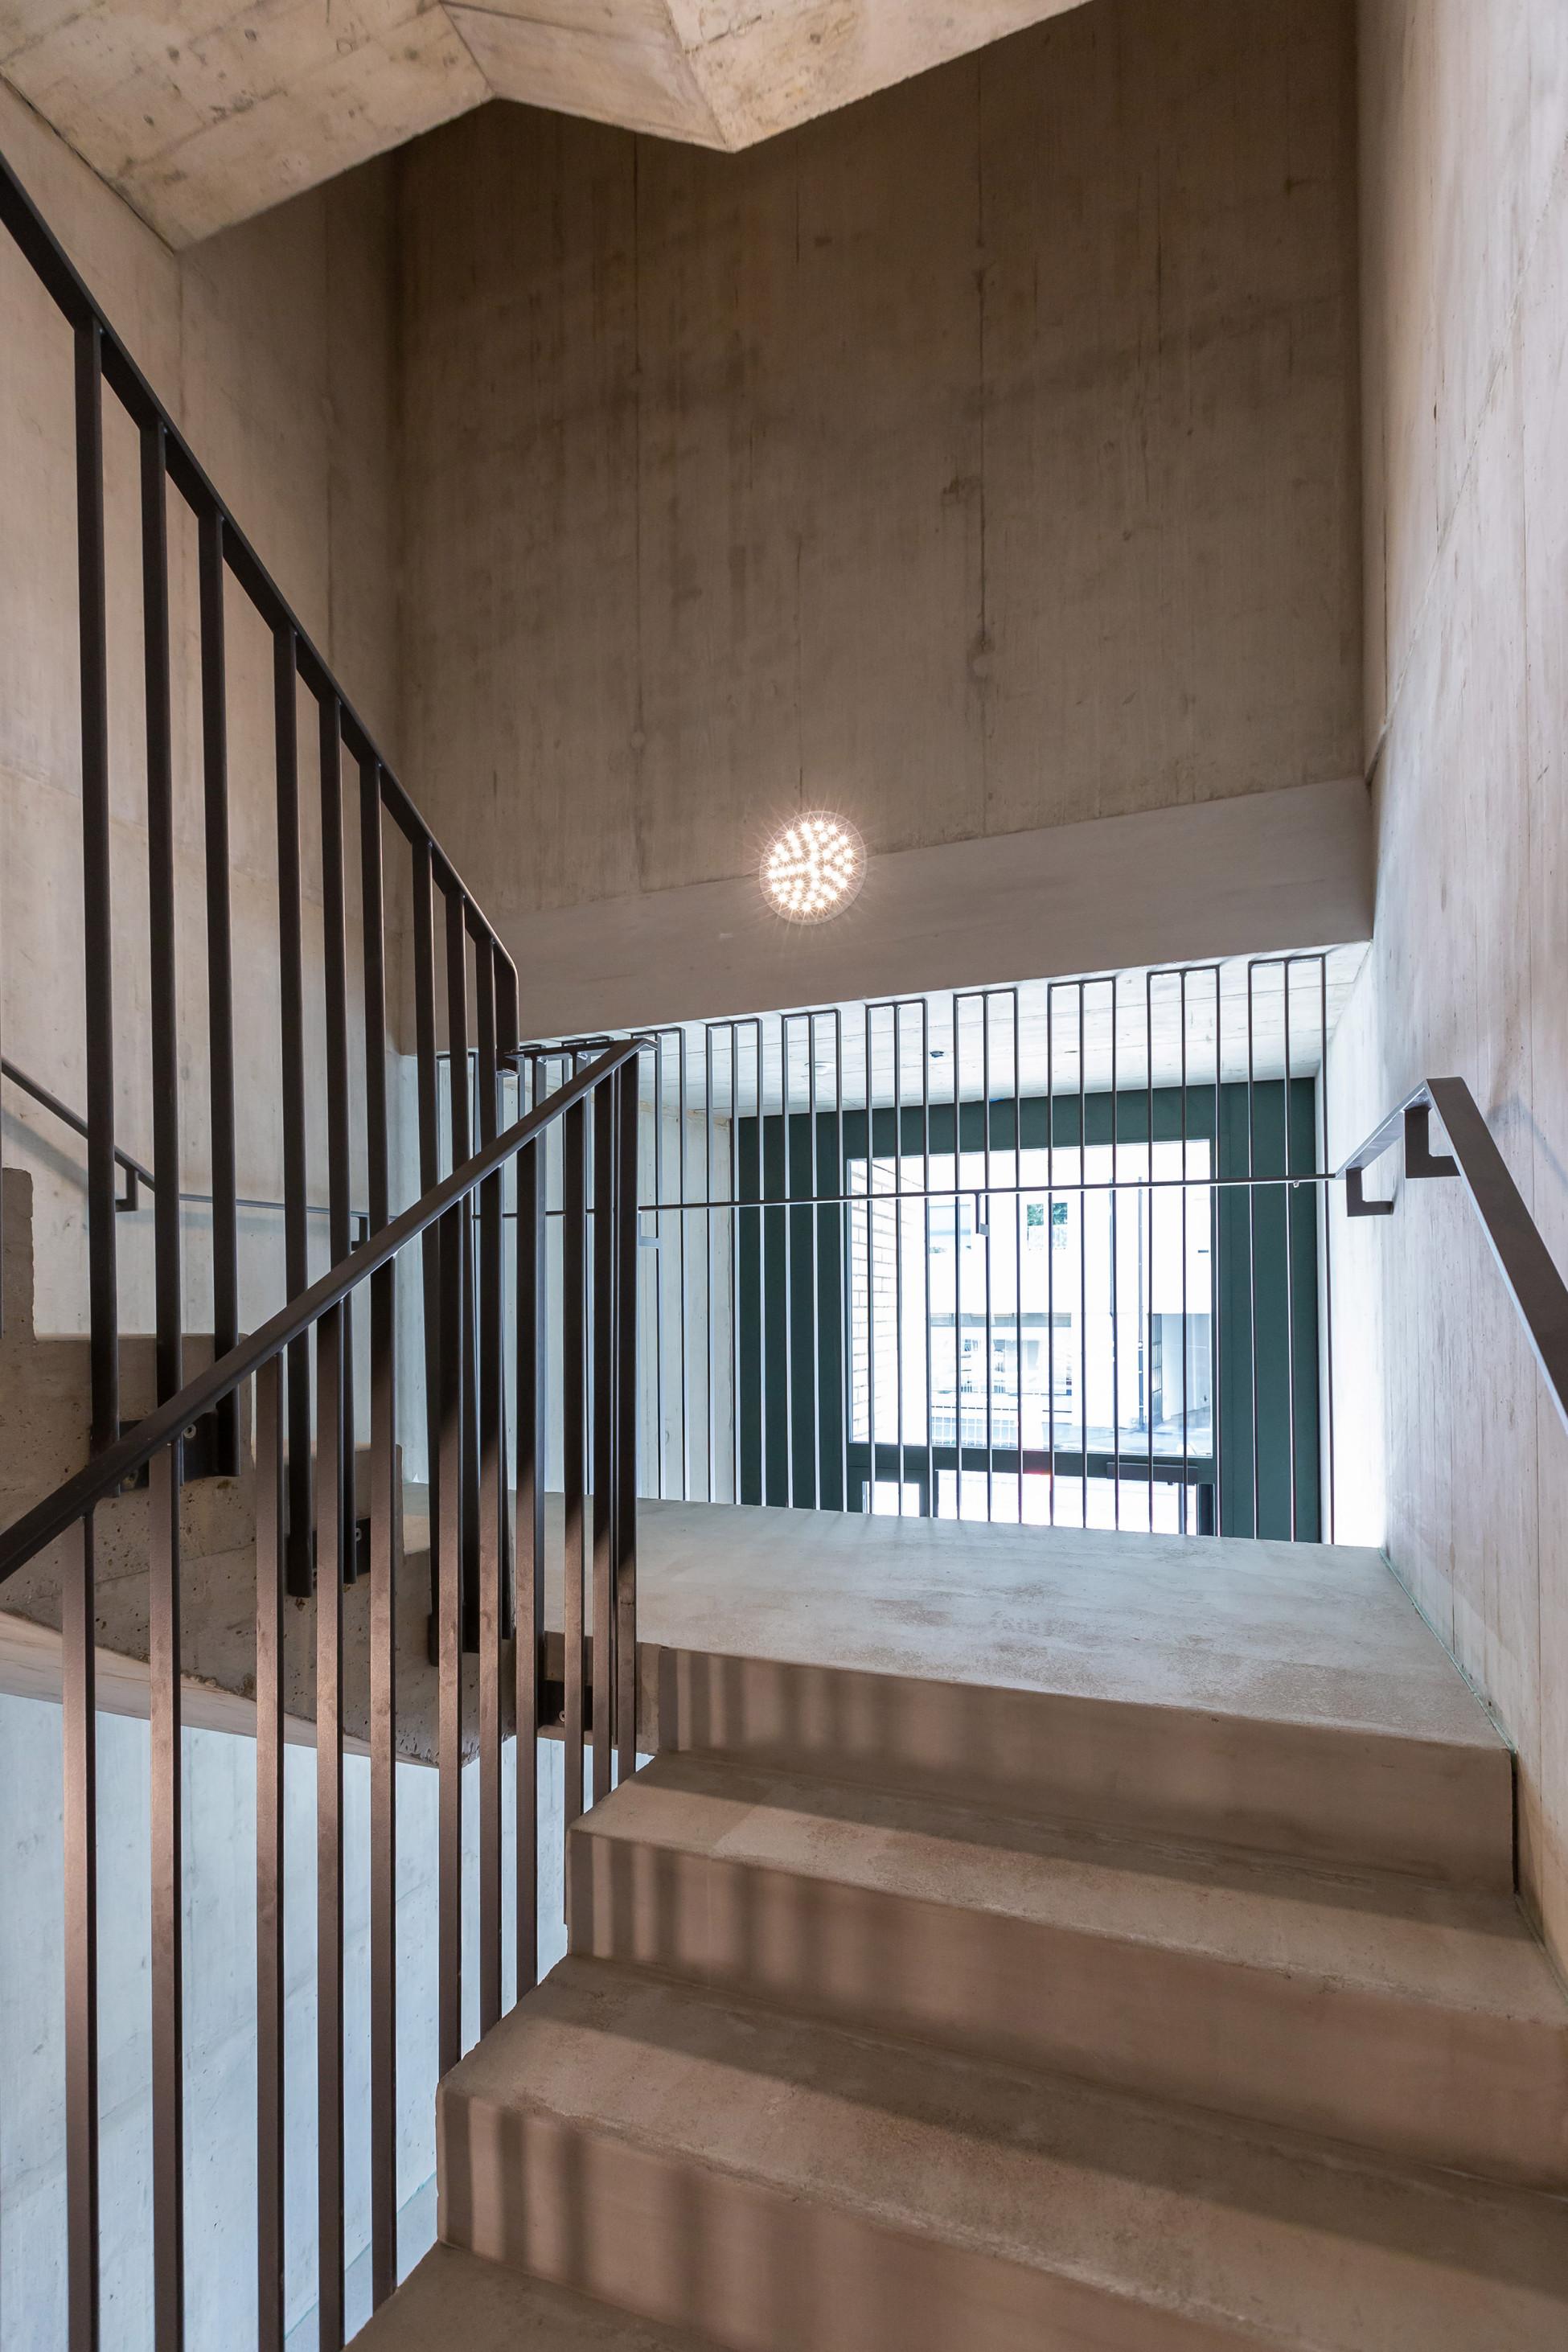 Betonkosmetik Basel Ersatzneubau Mehrfamilienhaus